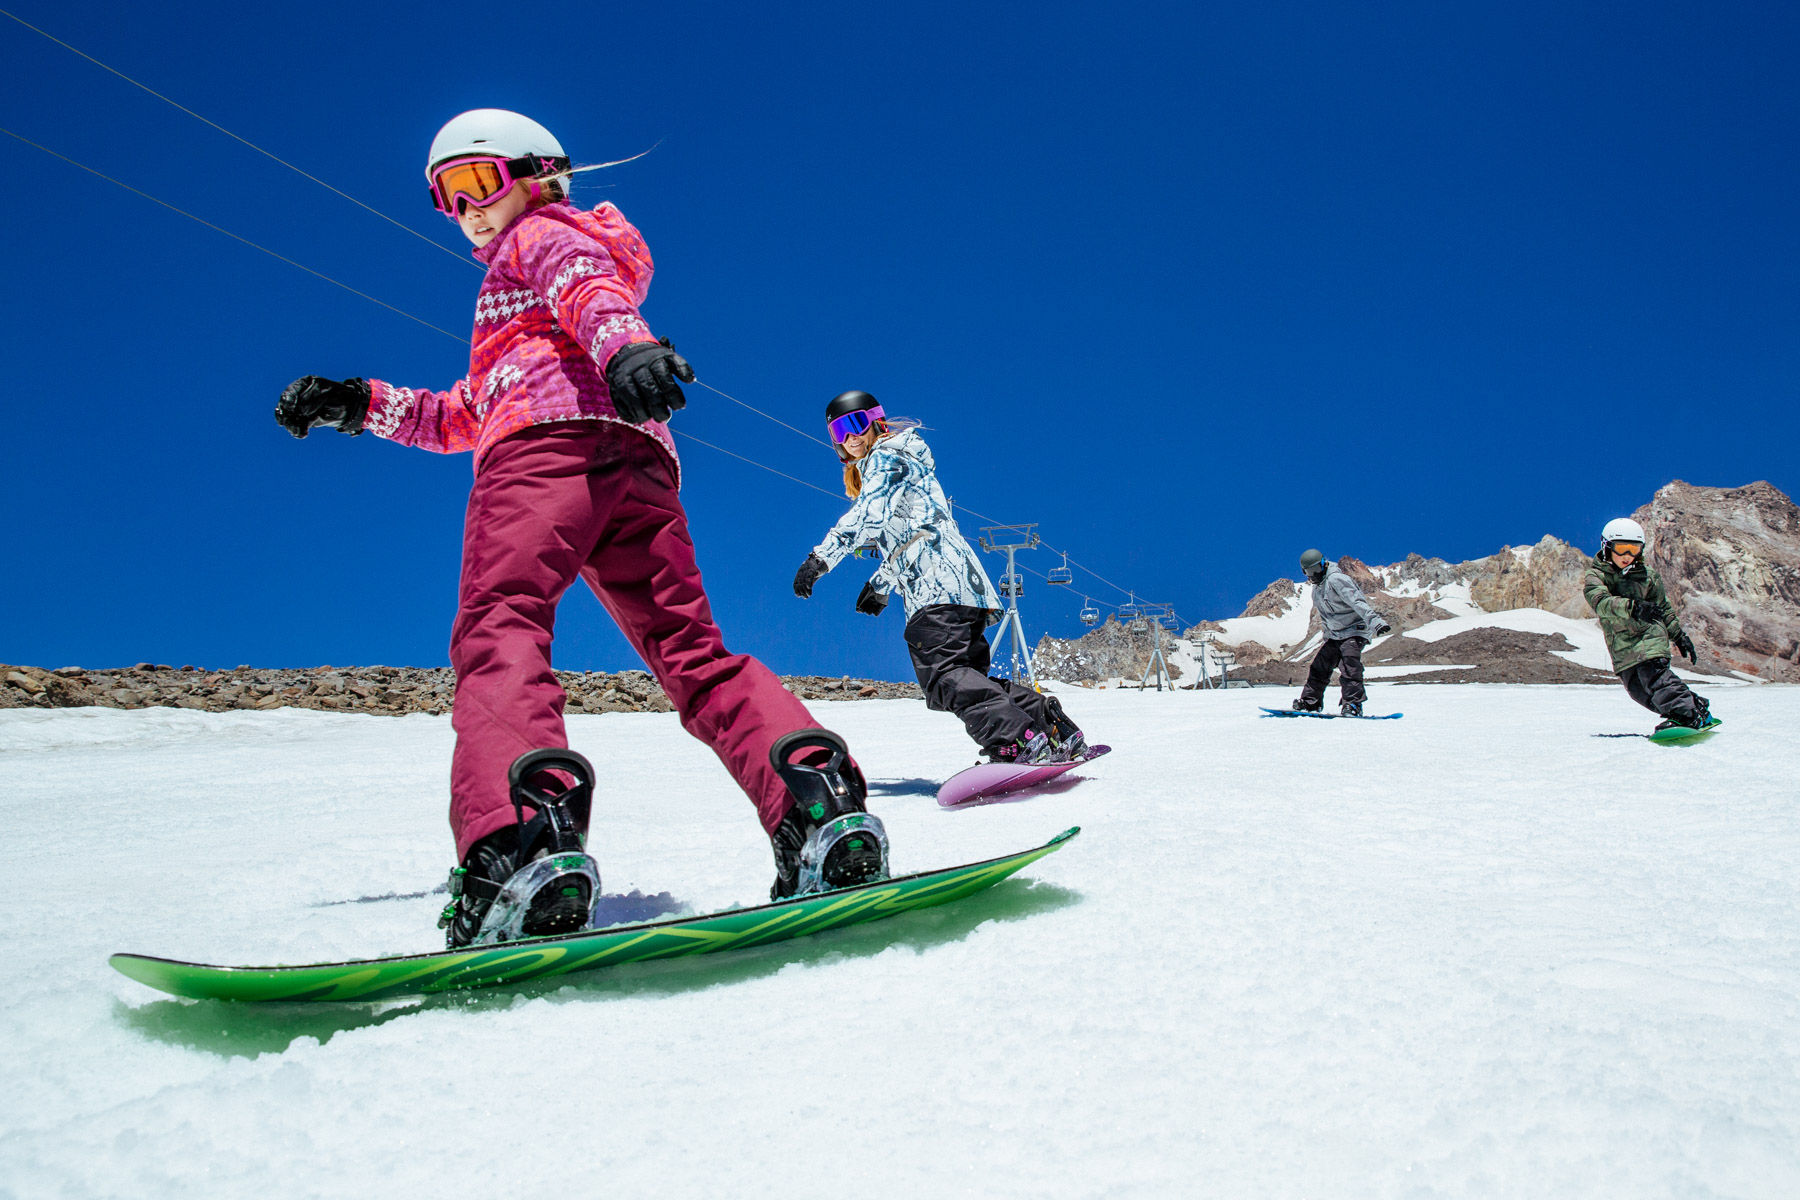 Family Riding Snowboards Down Mountain